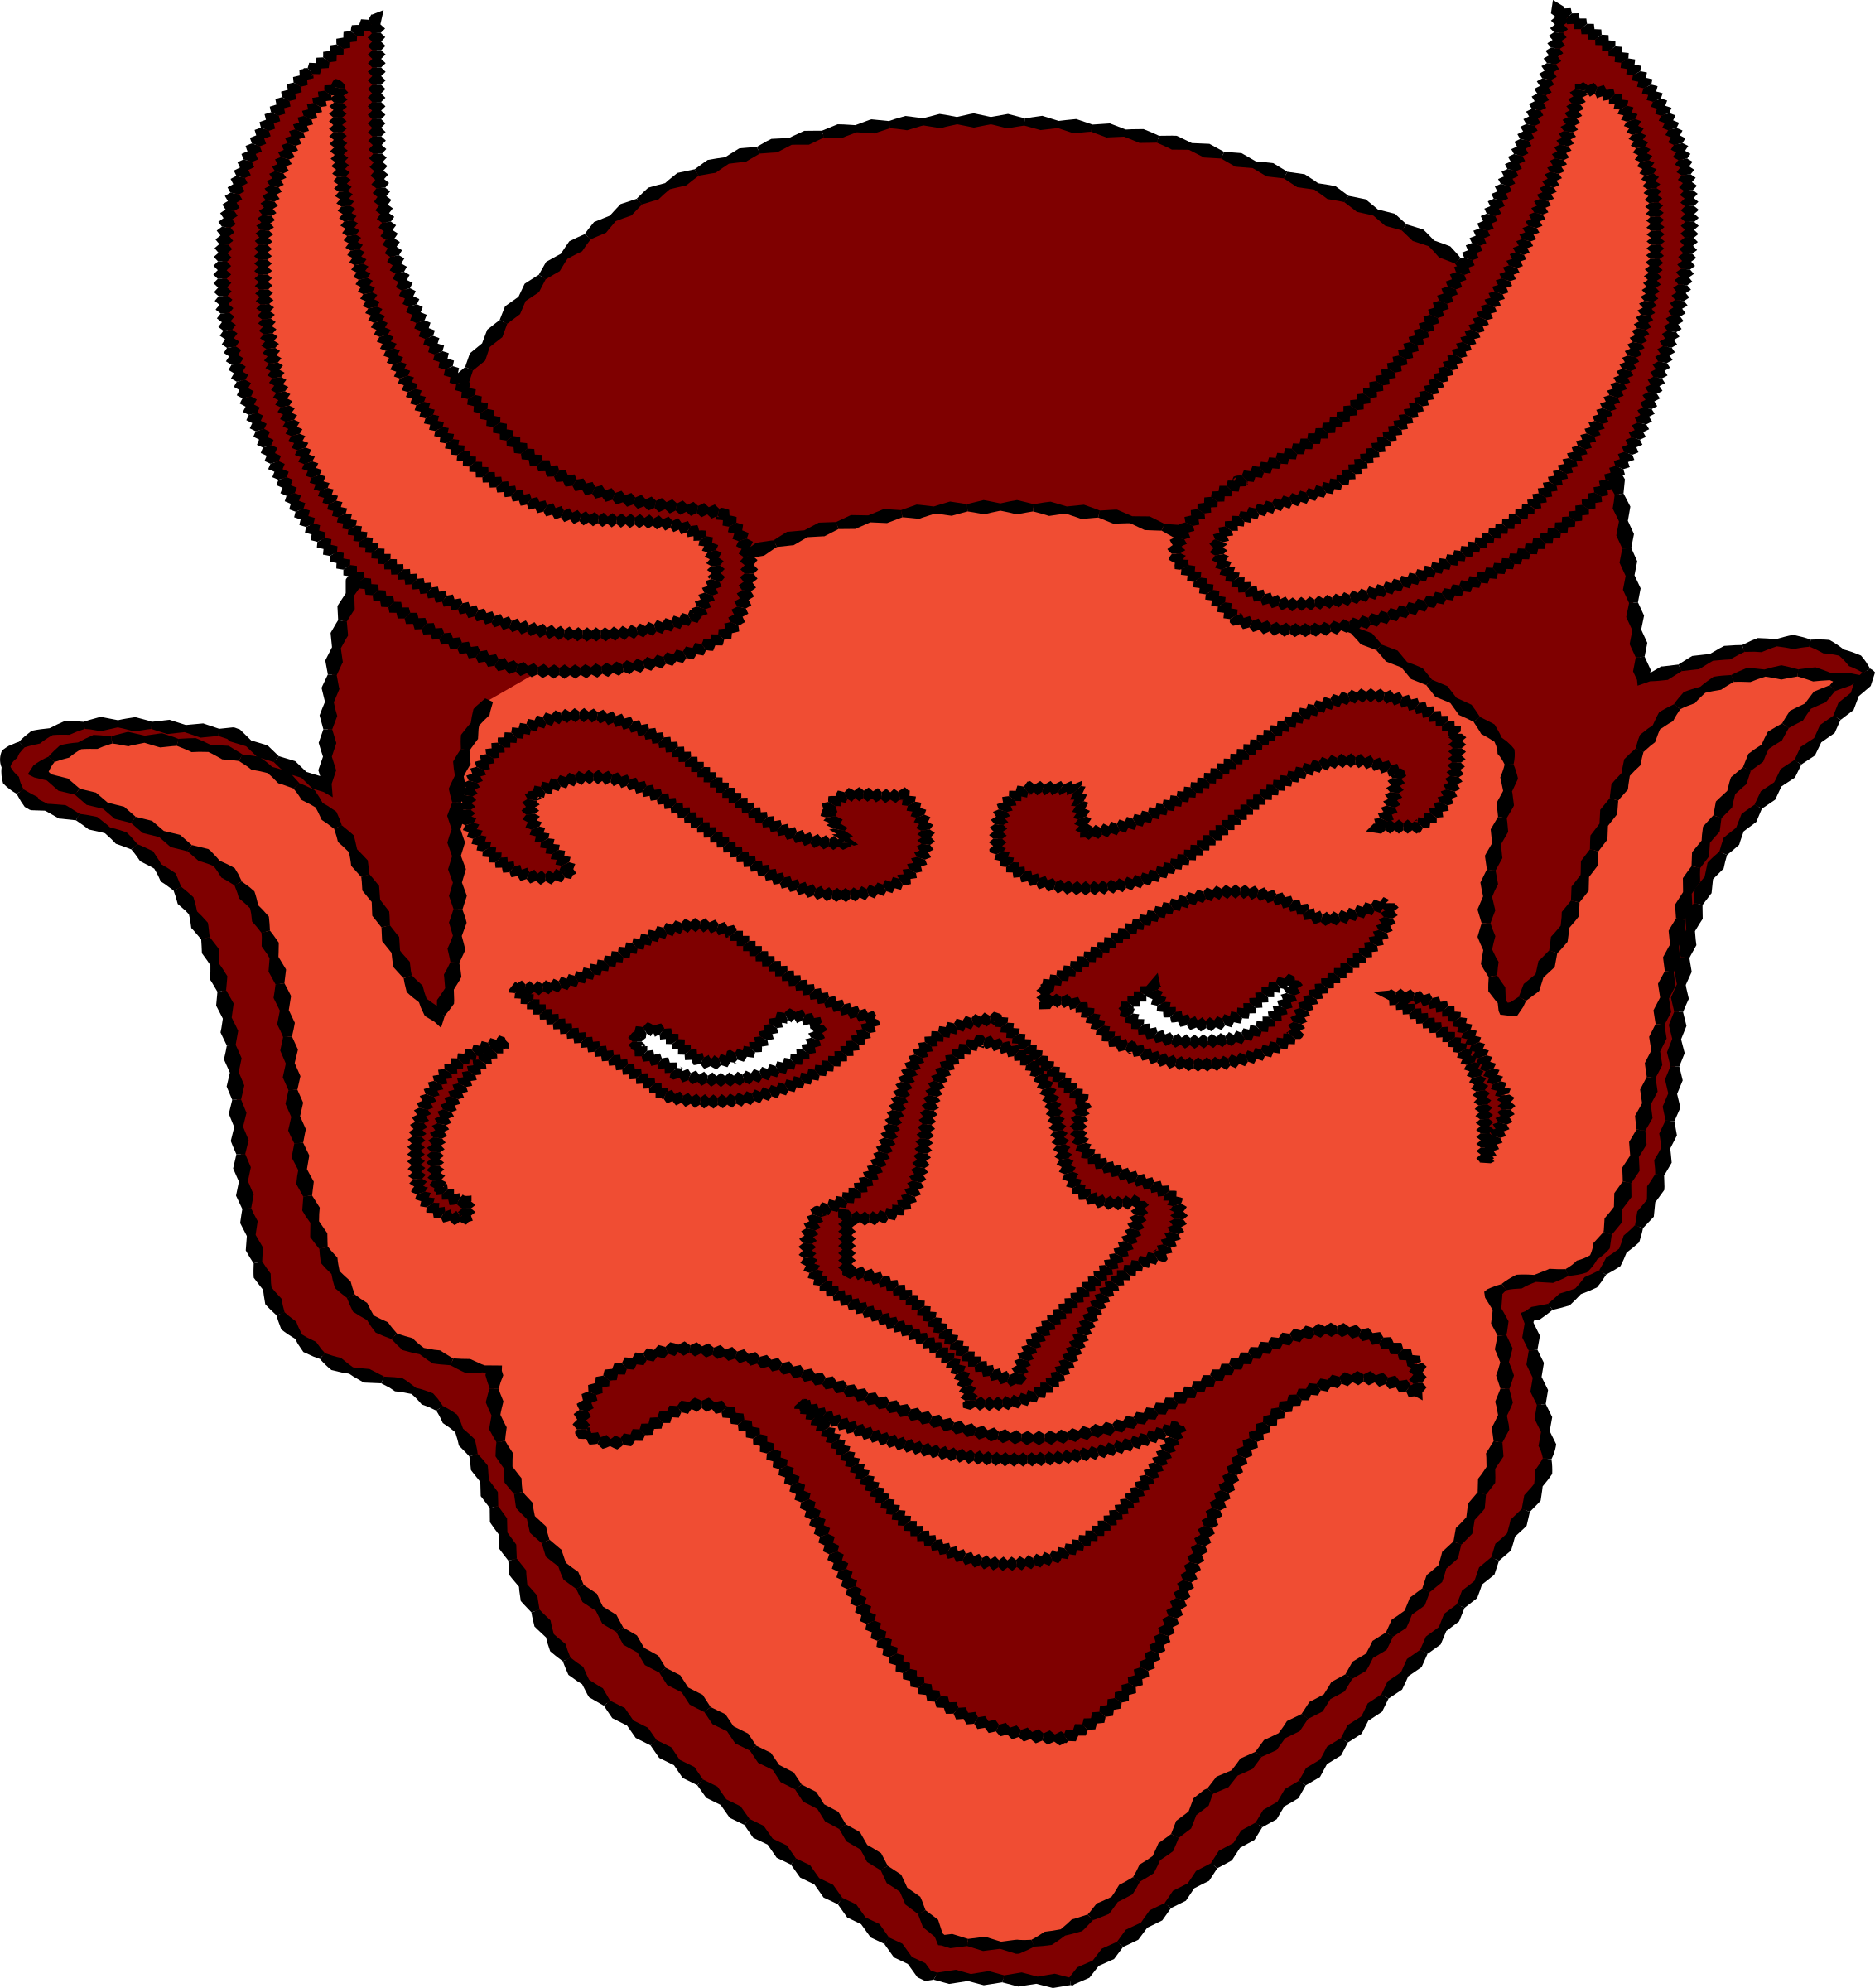 Clipart smile devil. Head big image png